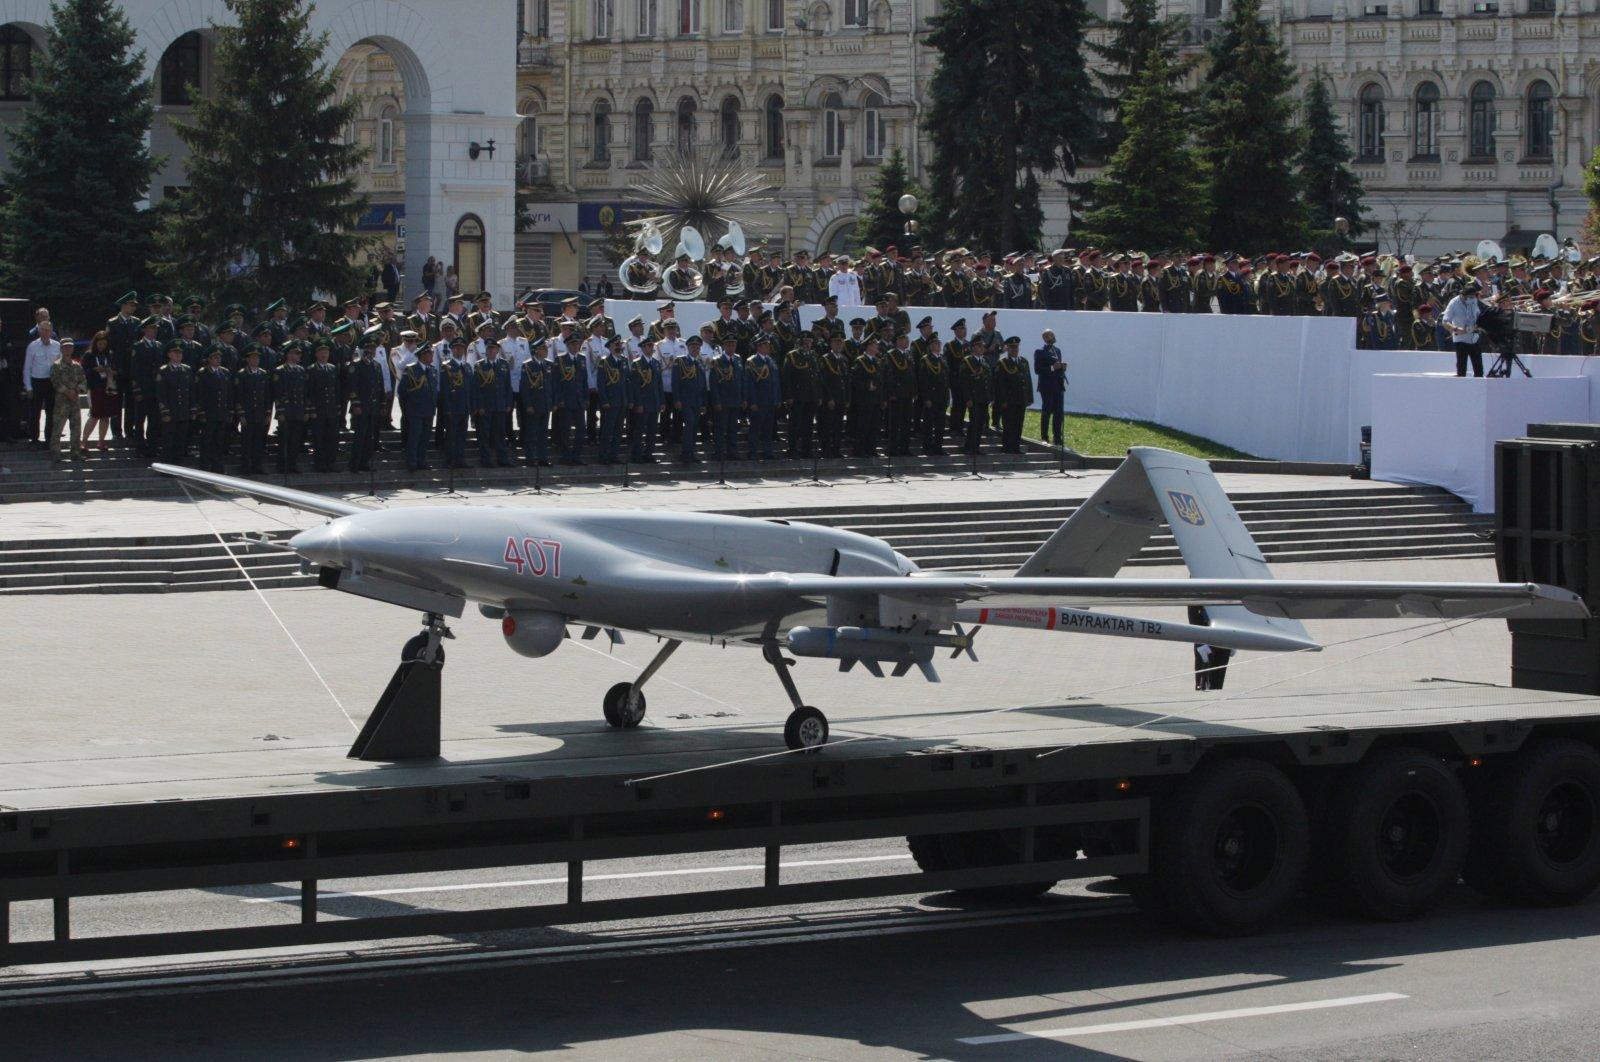 A Bayraktar TB2 UCAV belonging to the Ukrainian army, during a parade to commemorate the 30th anniversary of Ukraine's independence, Kyiv, Ukraine, Aug. 24, 2021. (AA Photo)